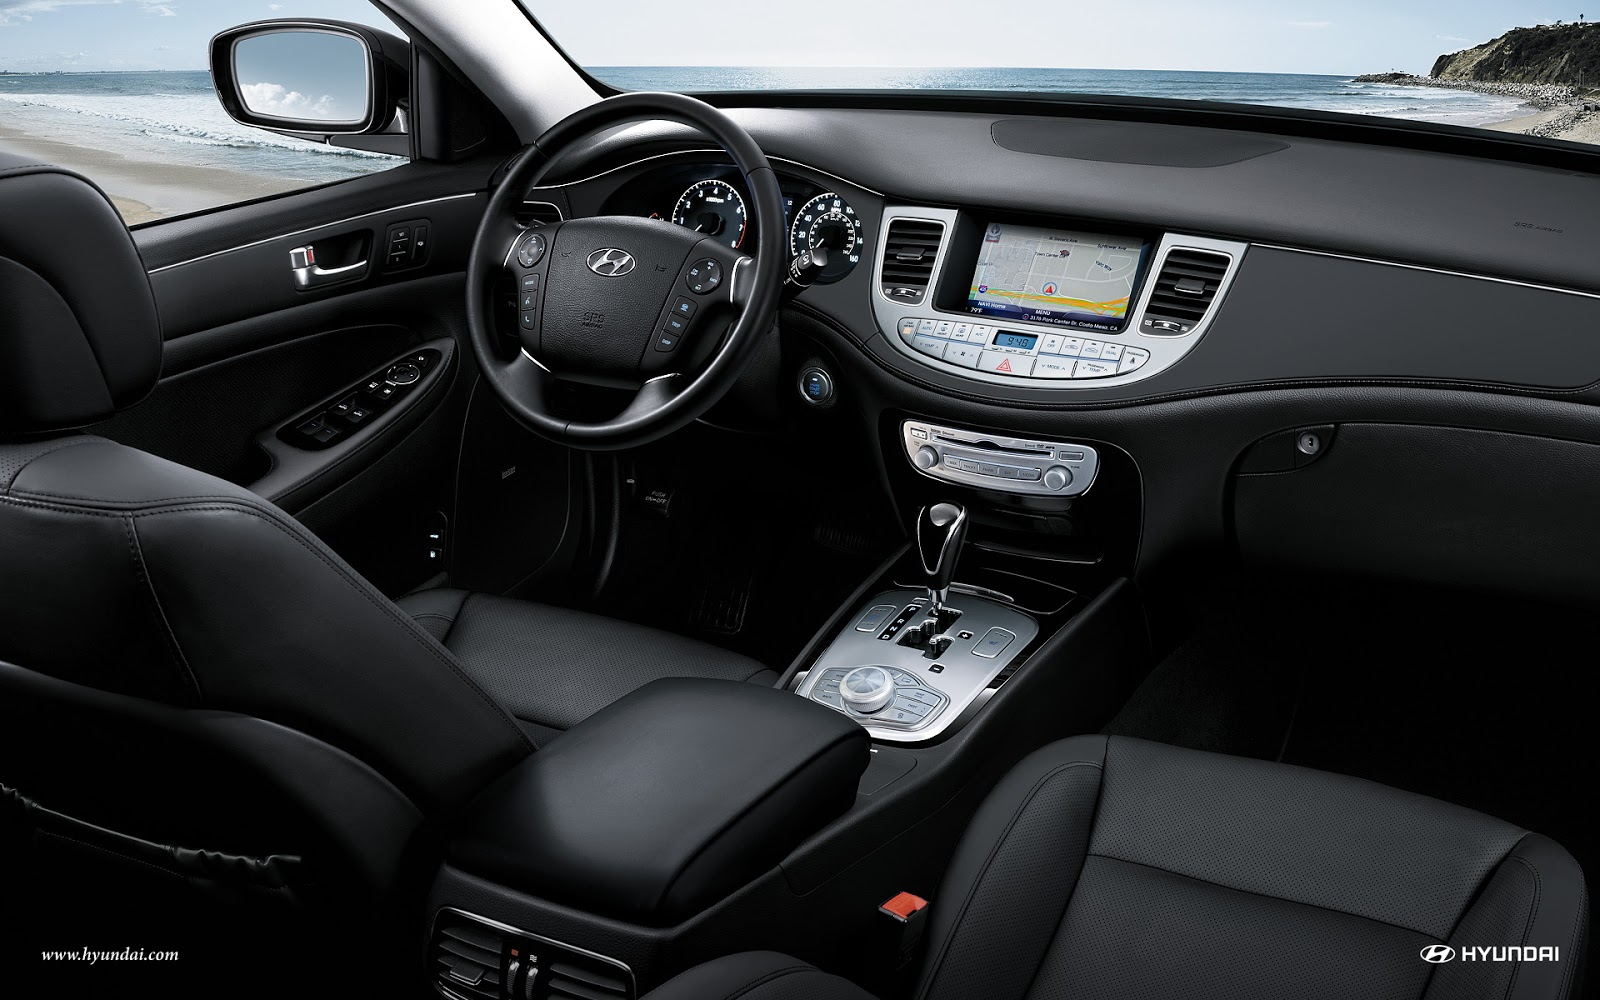 http://2.bp.blogspot.com/-mYNQnr4-gyc/UMQRNS_RtAI/AAAAAAAAMYM/YcuTwoSdjeg/s1600/genesis-hyundai-2013-sedan-car-Interior-cockpit-steering-dashboard-black-leather-seats.jpg